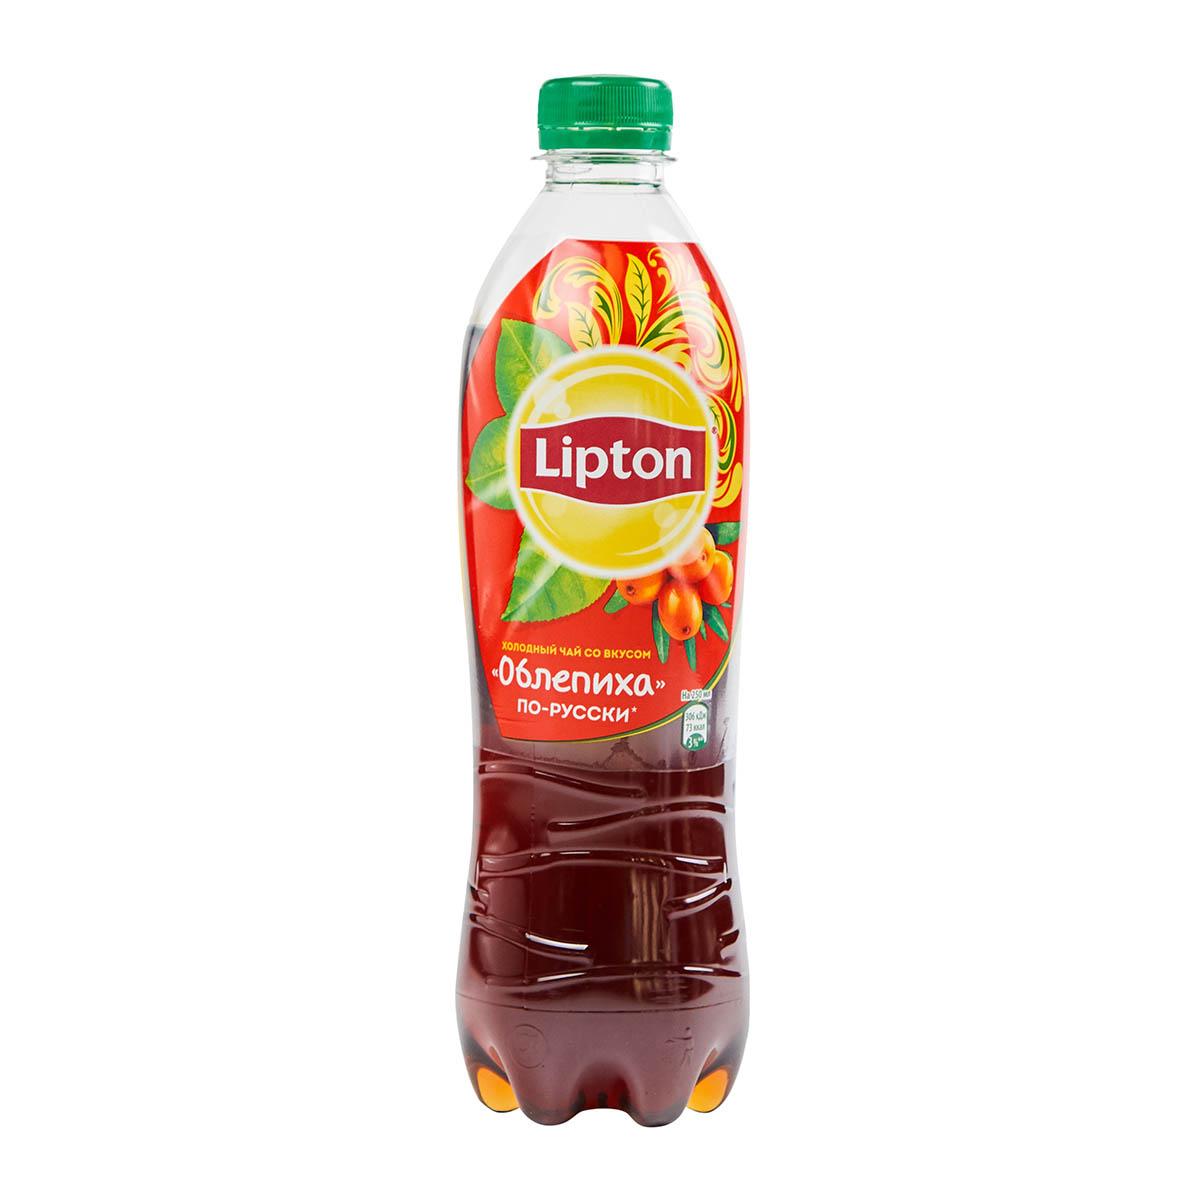 Lipton ice tea облепиха